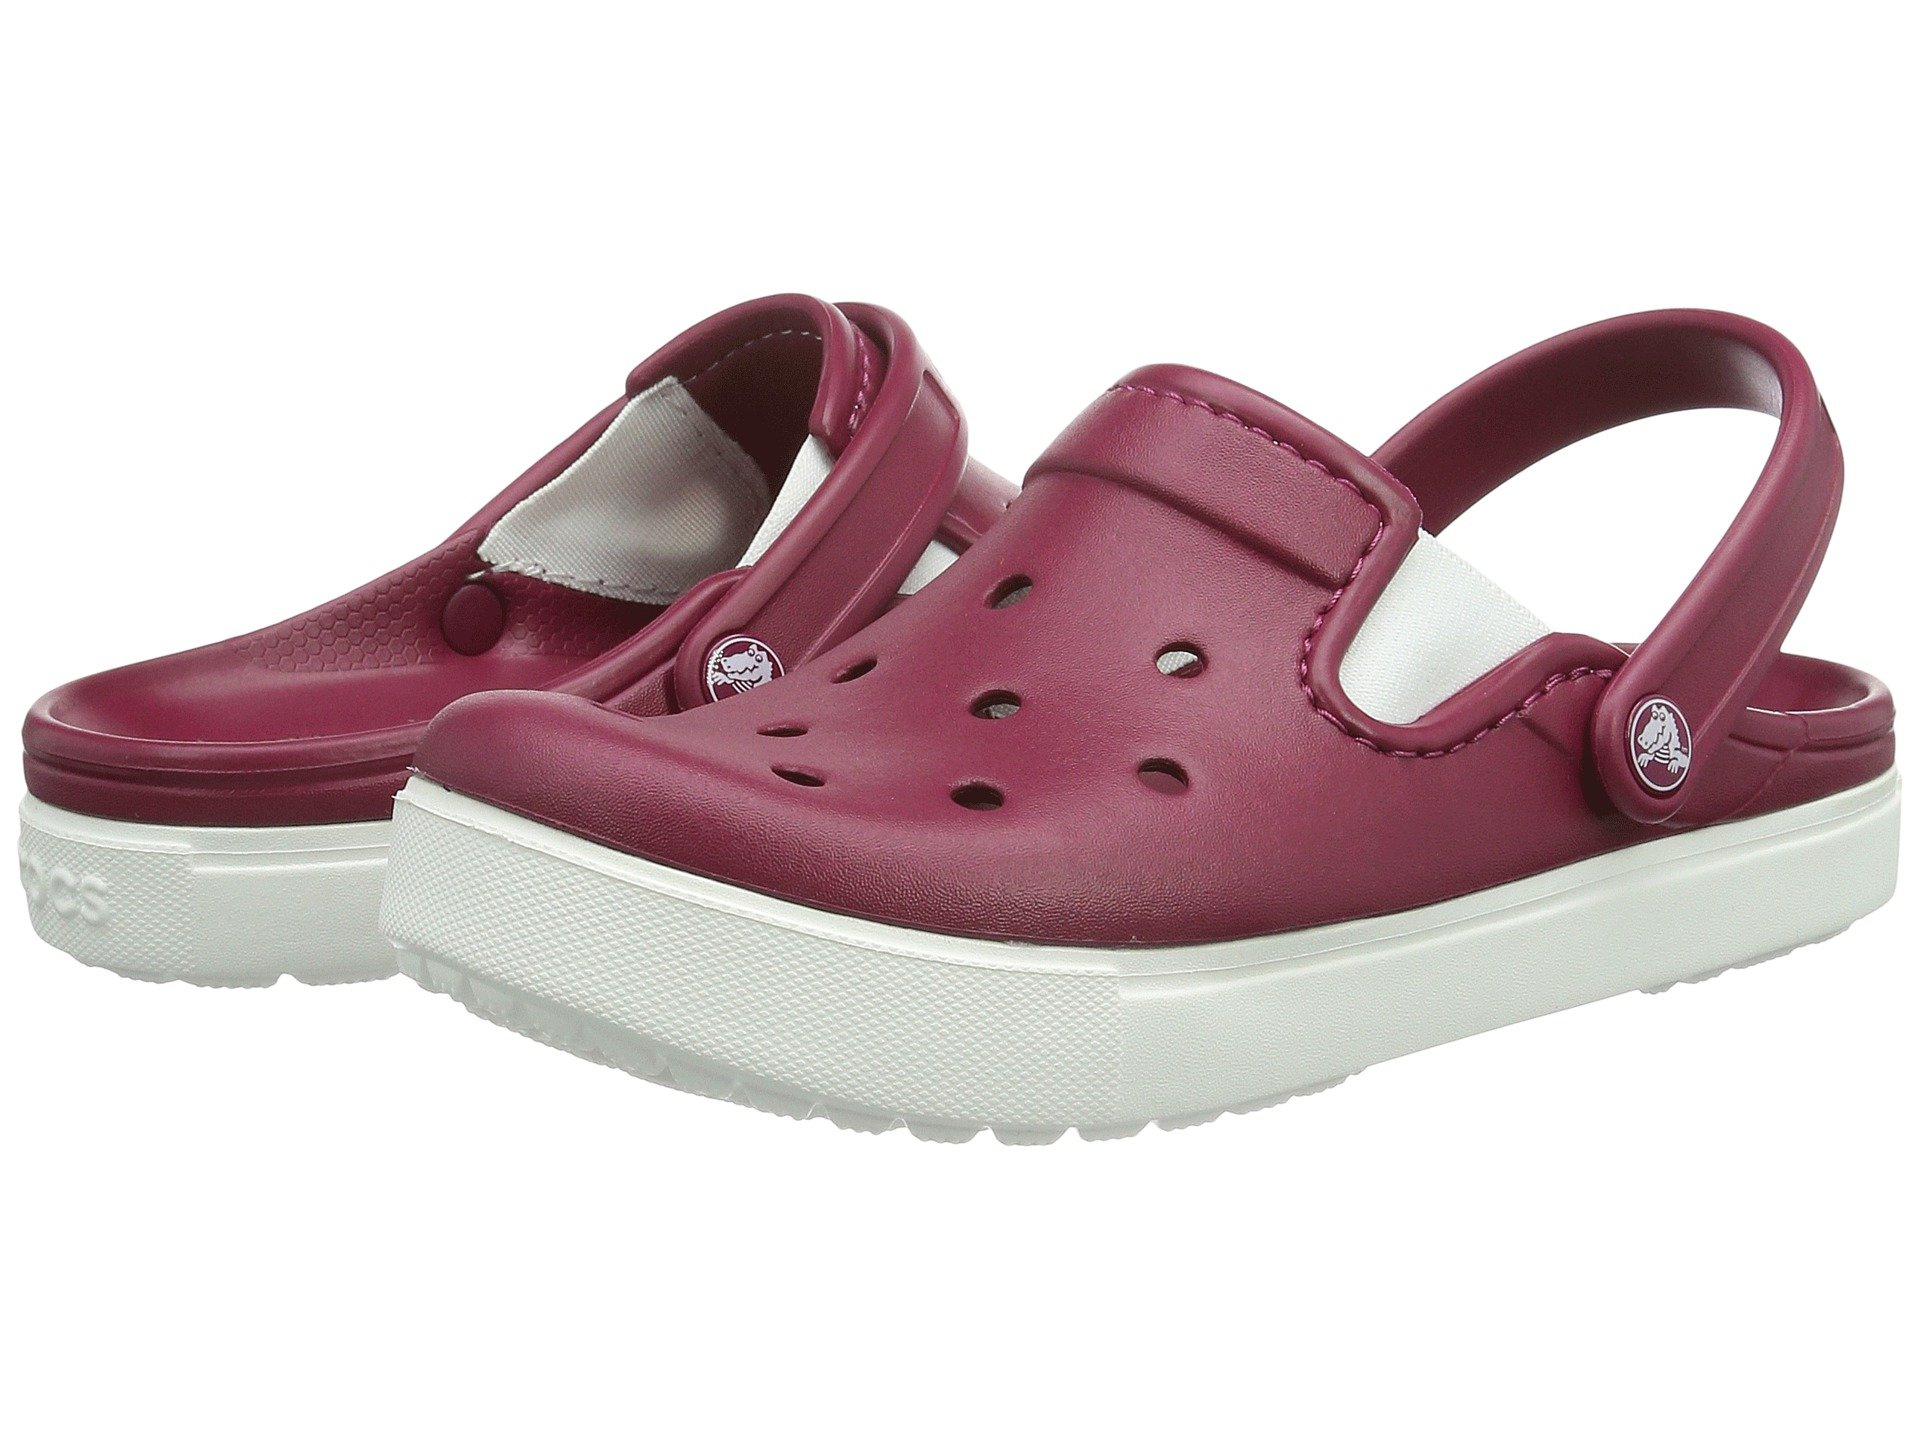 Calzado Sin Talon para Hombre Crocs CitiLane Clog  + Crocs en VeoyCompro.net